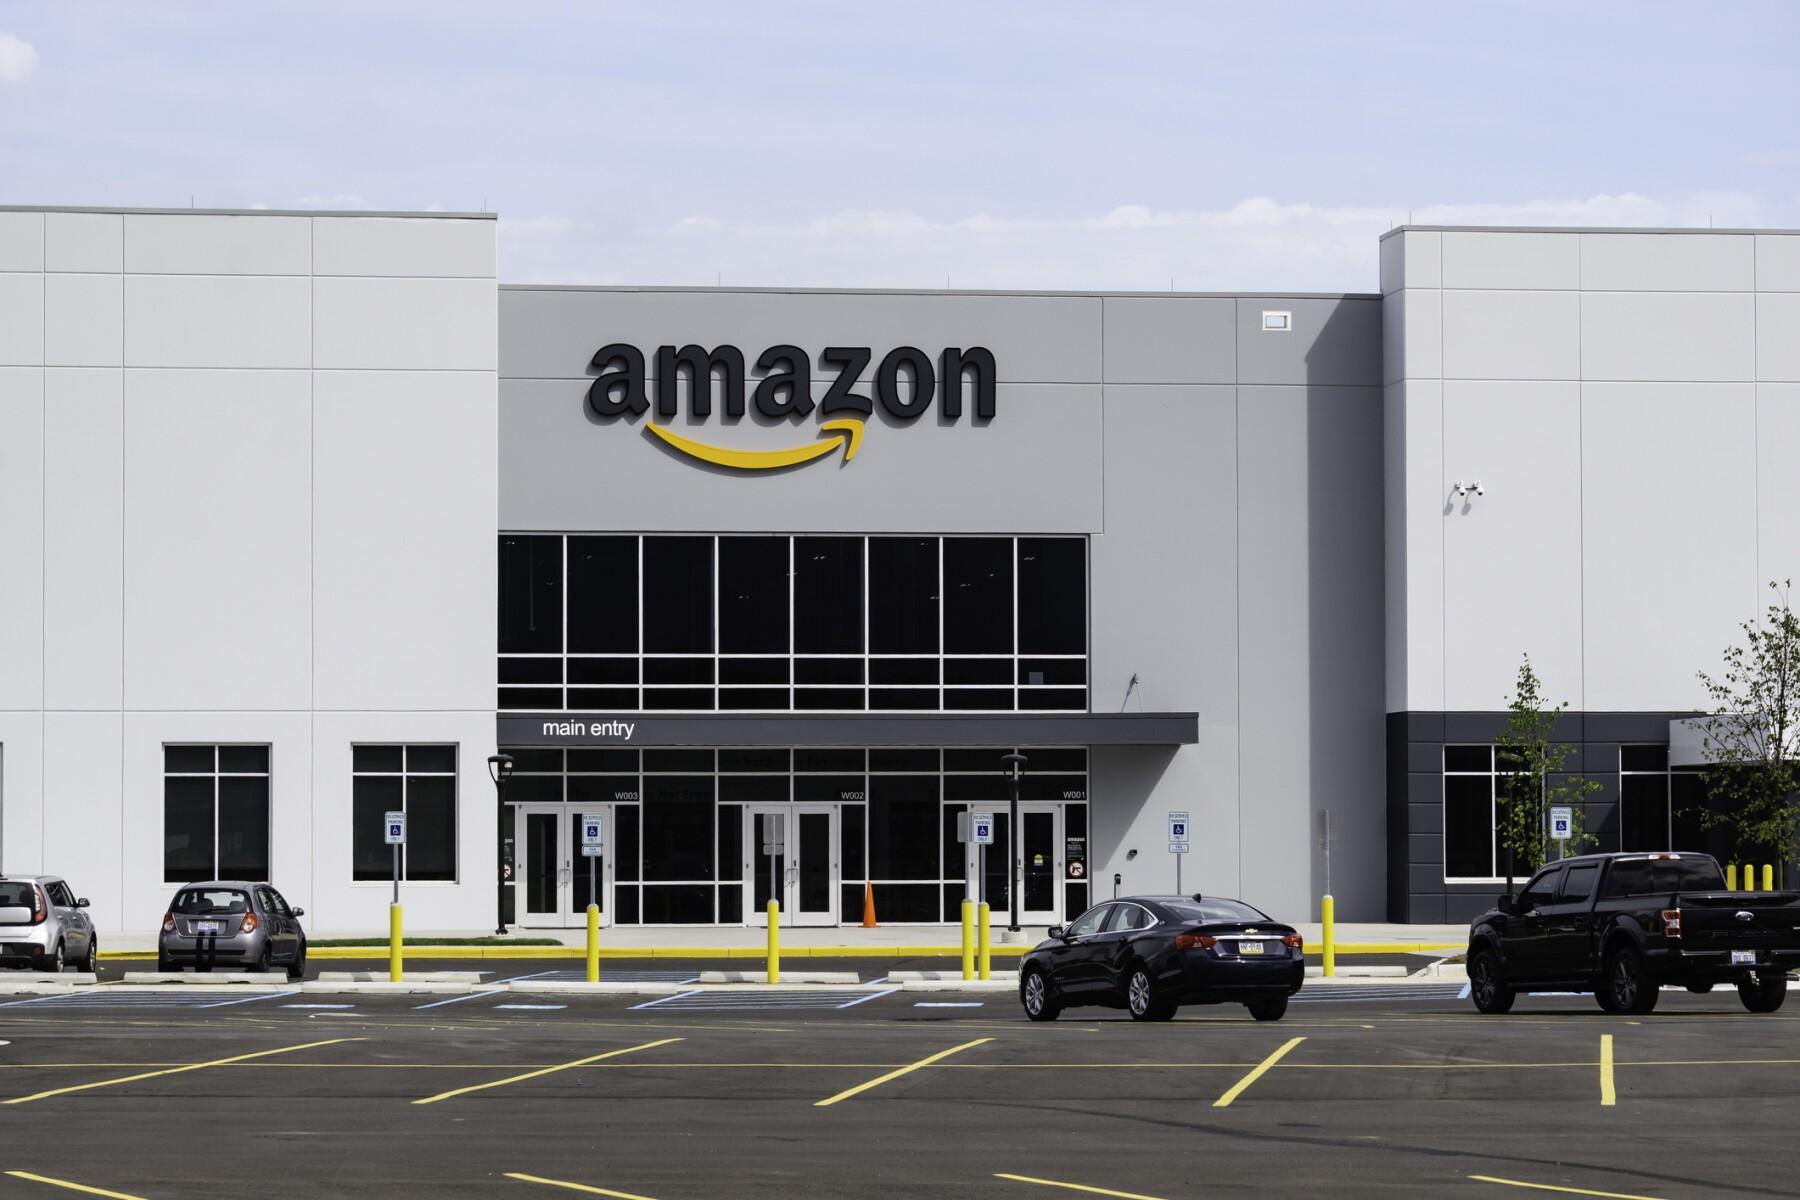 Amazon Distribution Center, Shelby Twp, Michigan